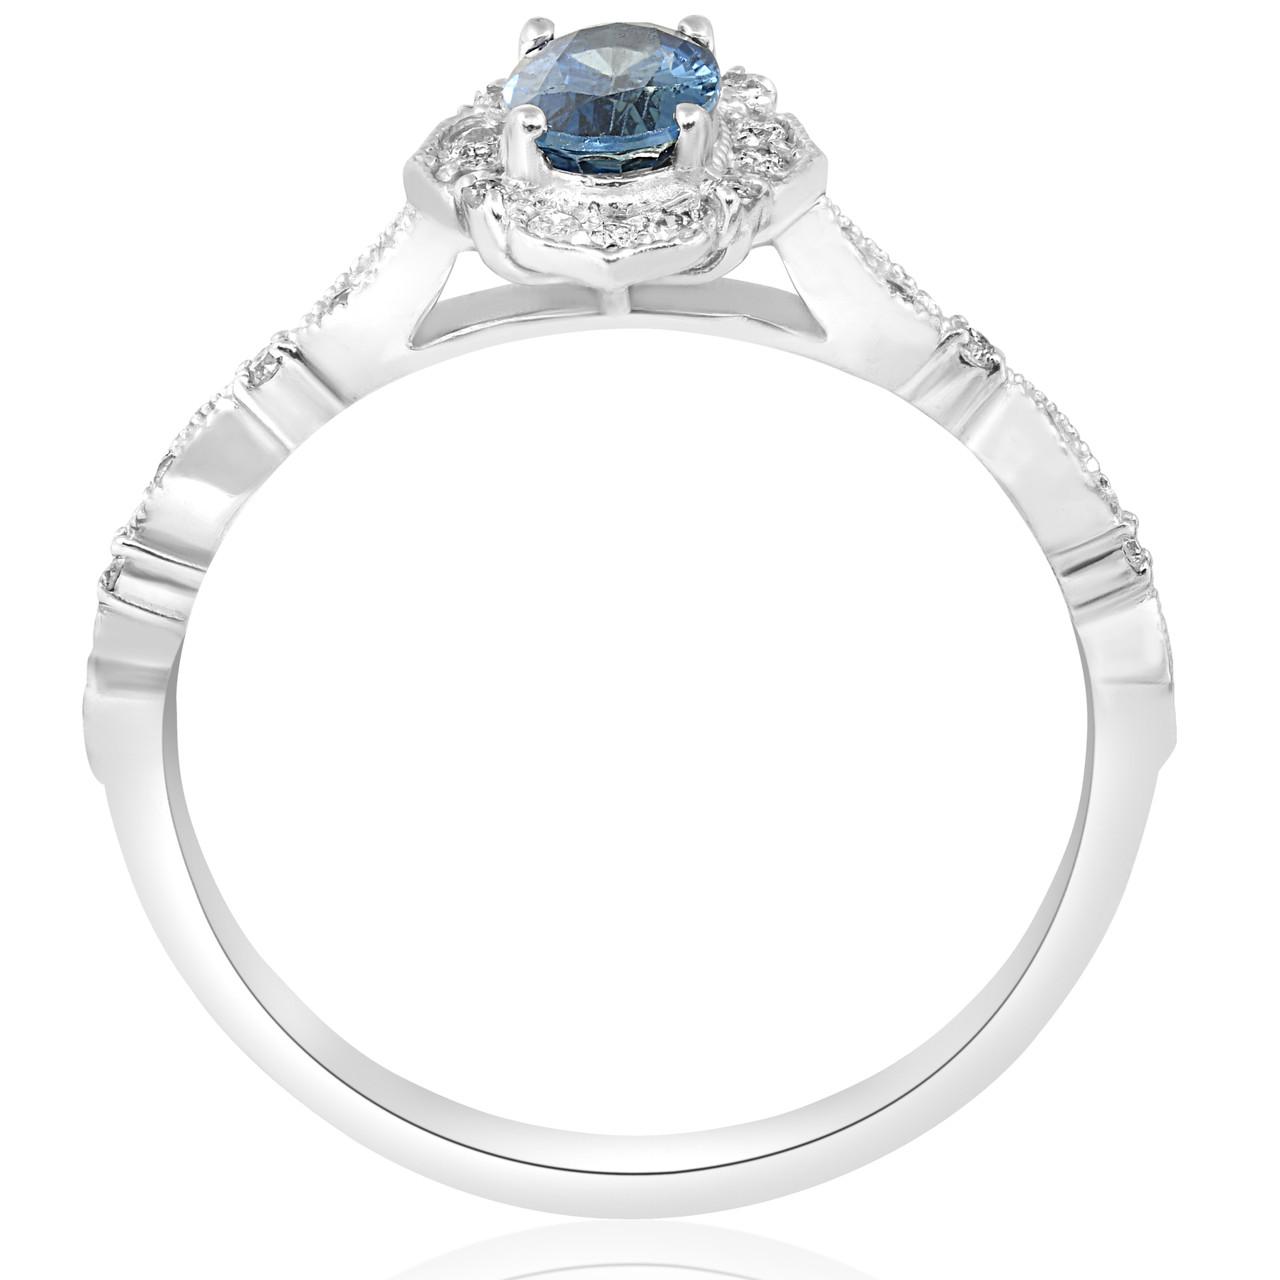 3 4ct Oval Blue Sapphire Diamond Halo Vintage Engagement Ring 14k